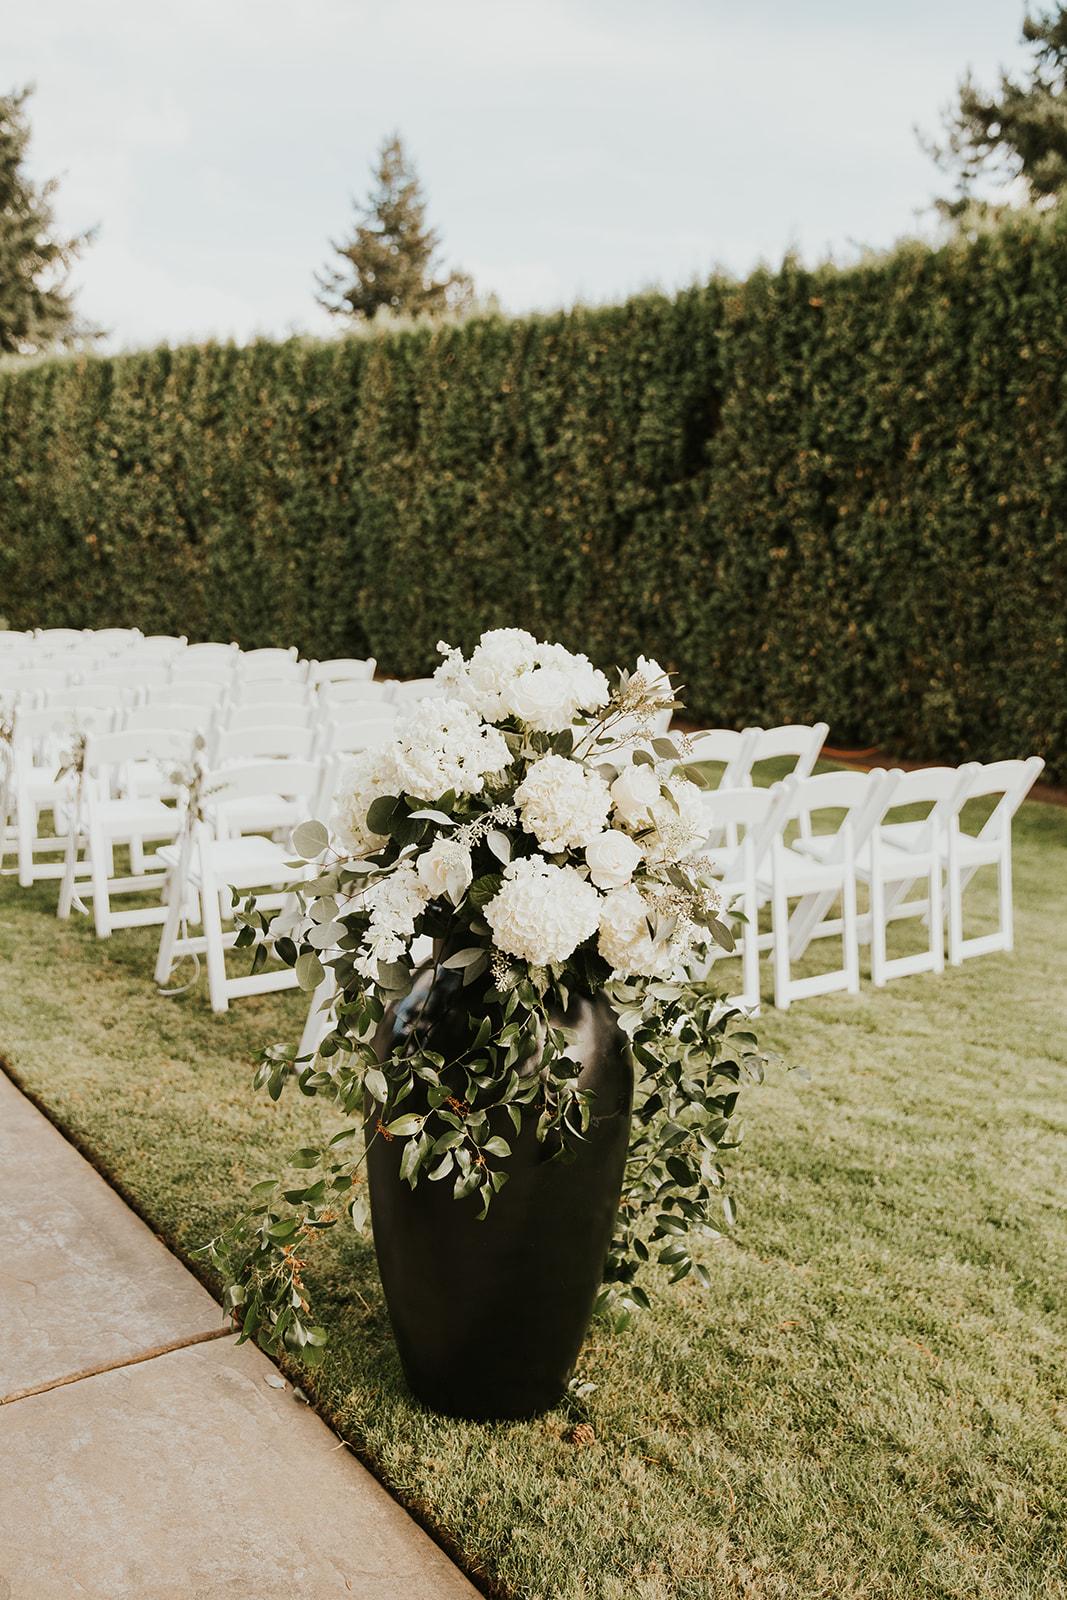 hydrangea, roses, stock flowers, southern smilax, smilax, urn arrangements, ceremony decor, classic wedding flowers